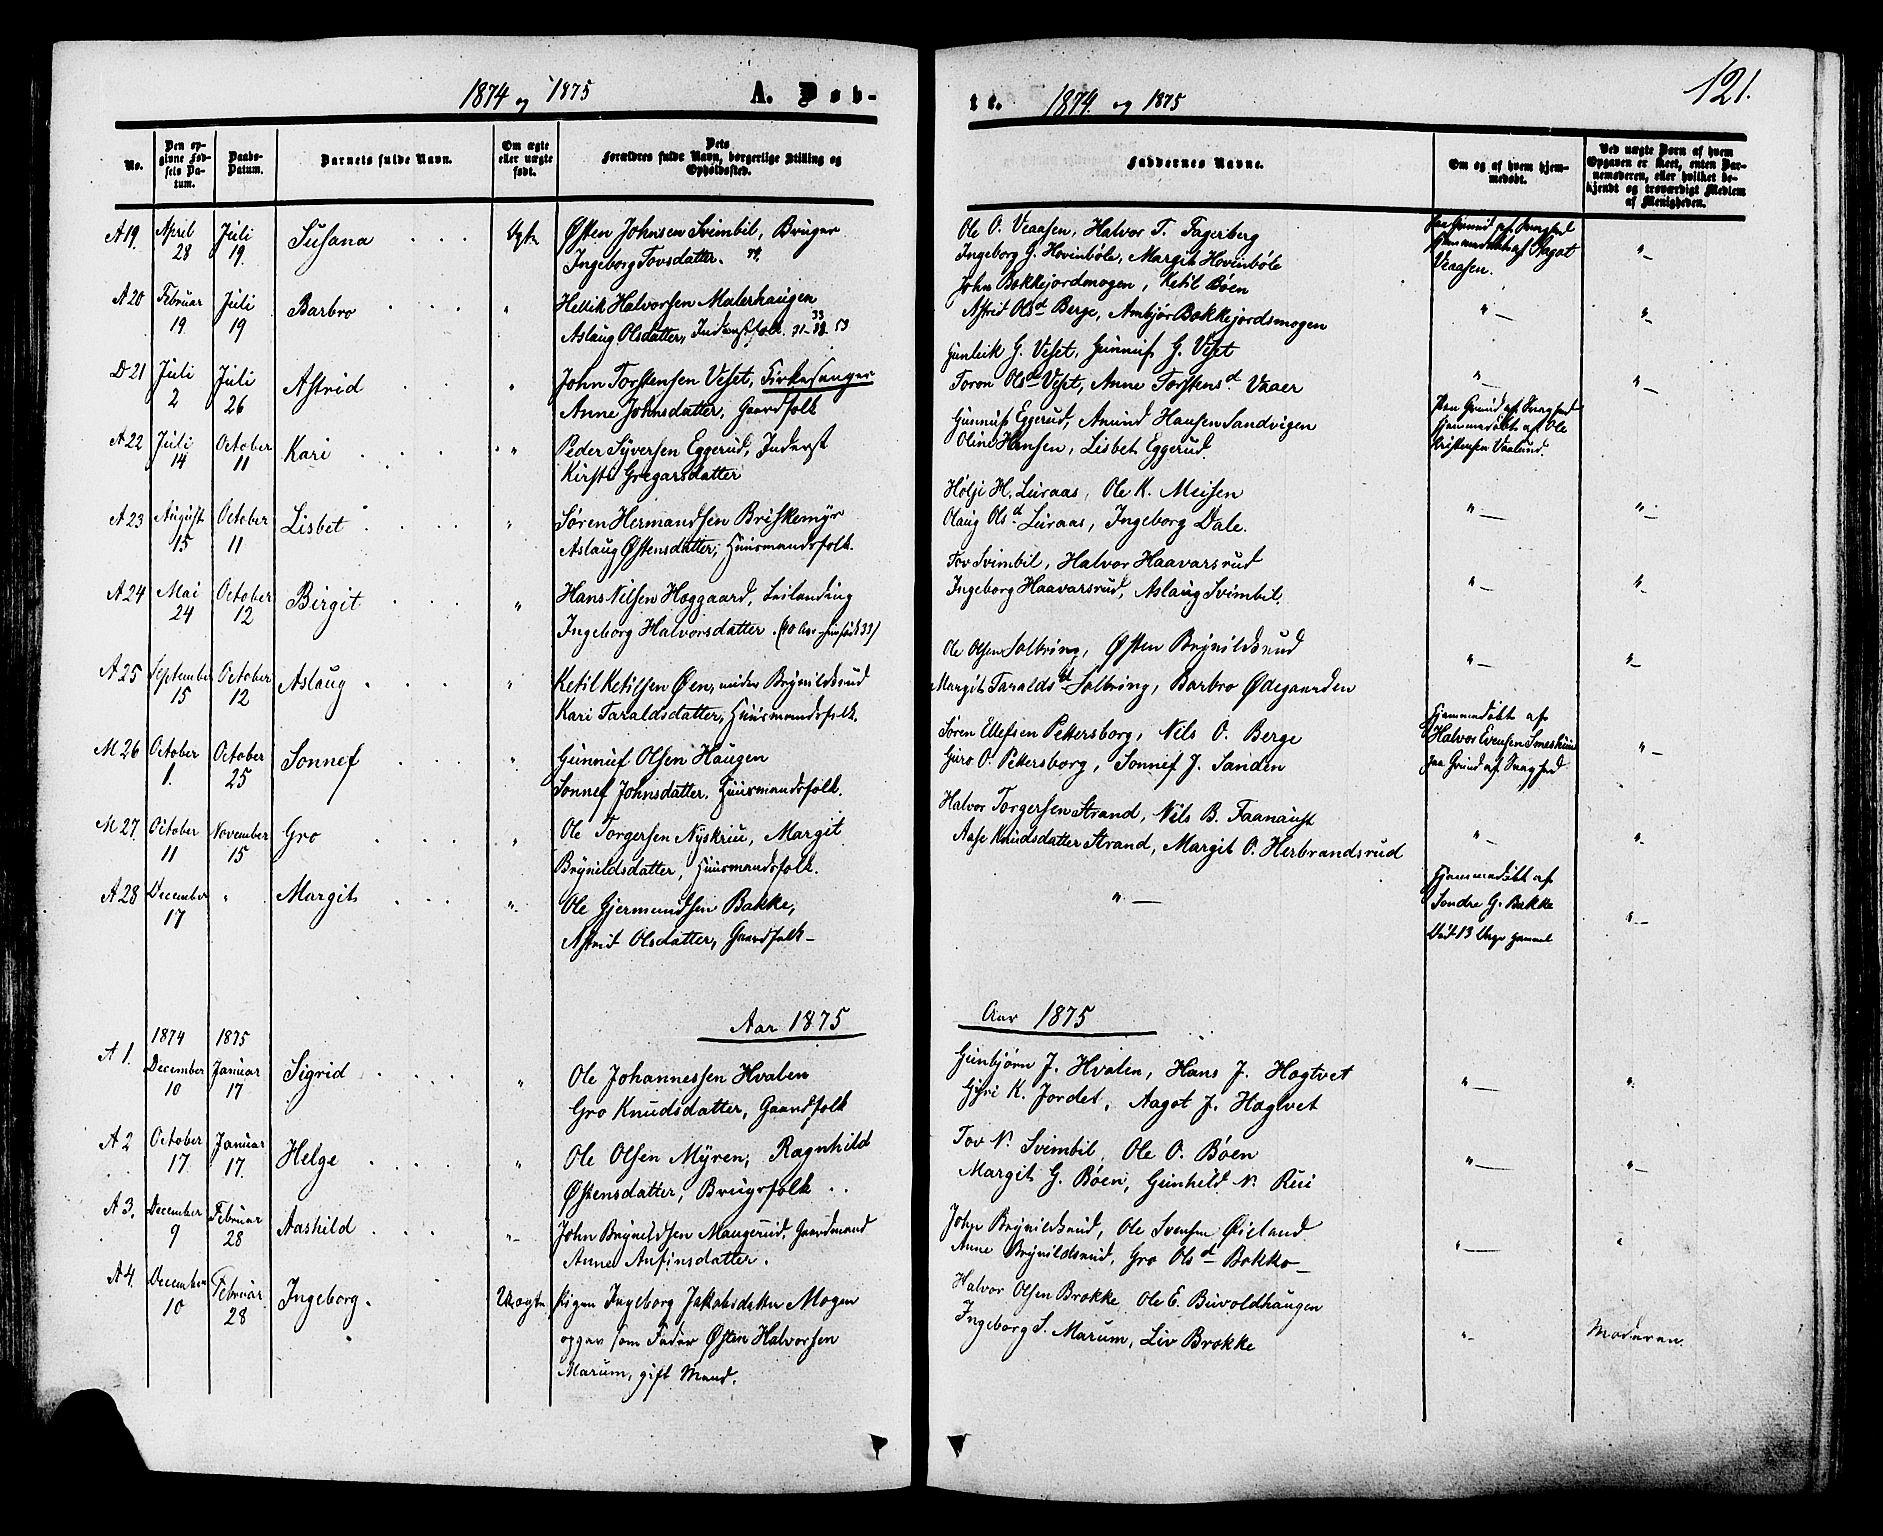 SAKO, Tinn kirkebøker, F/Fa/L0006: Ministerialbok nr. I 6, 1857-1878, s. 121